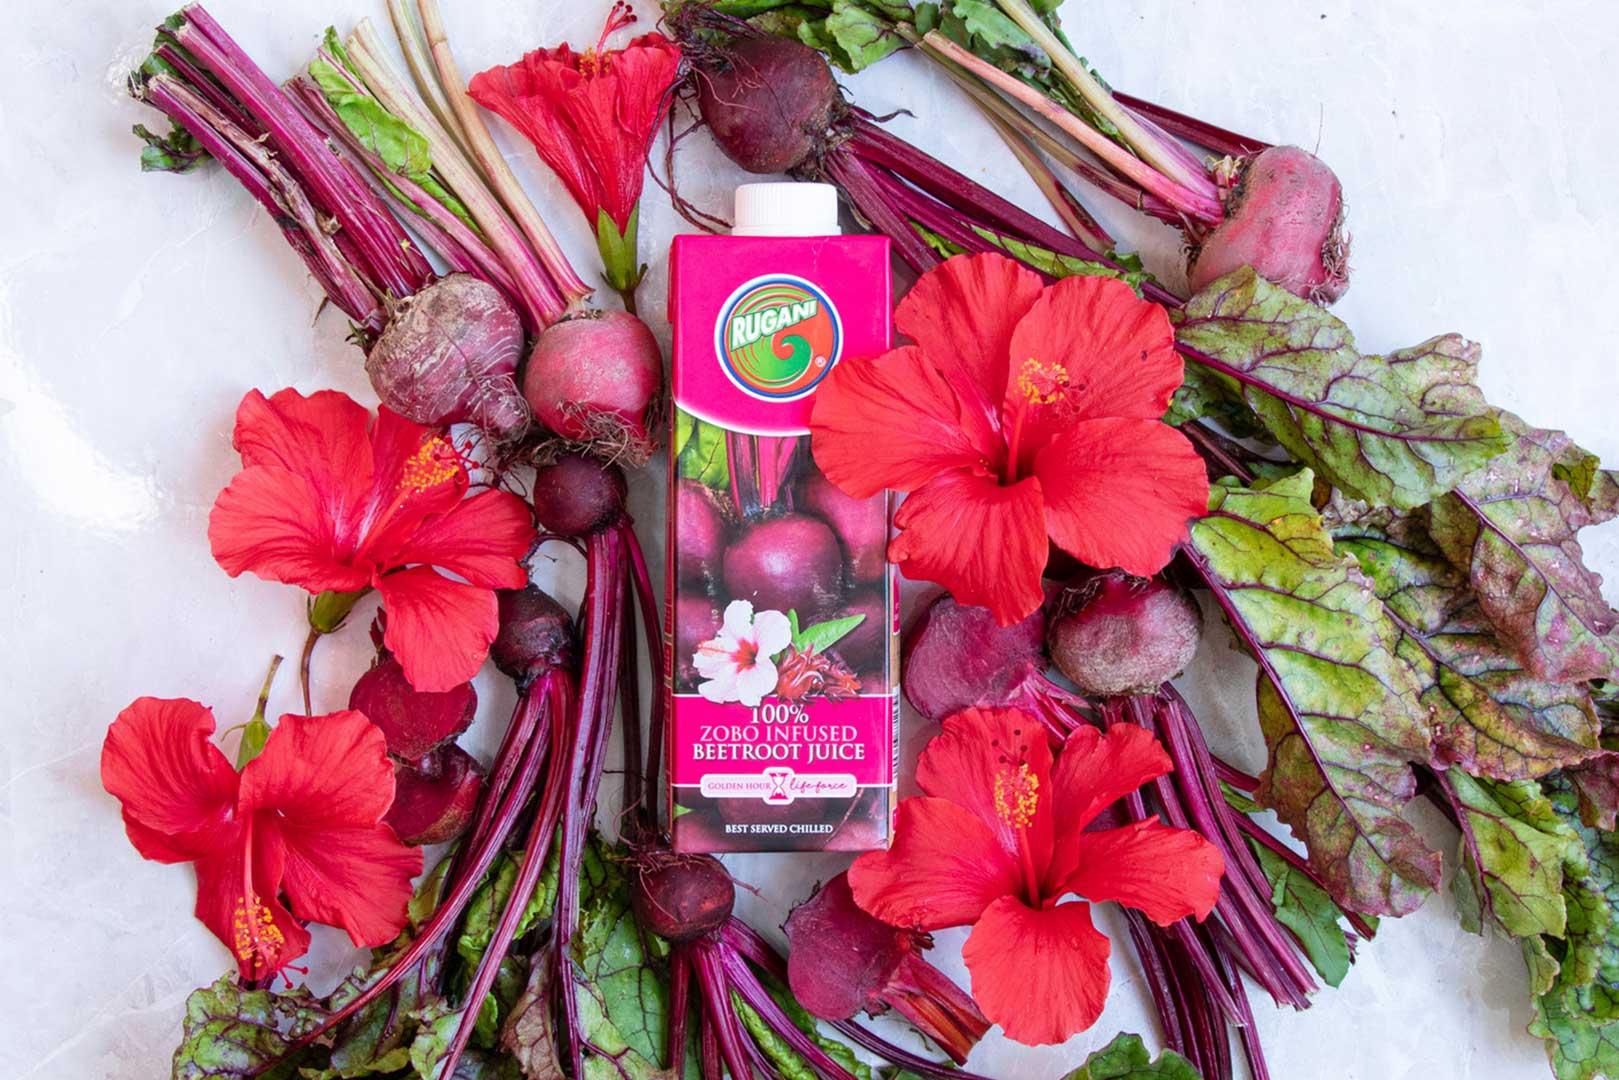 100% zobo infused beetroot juice